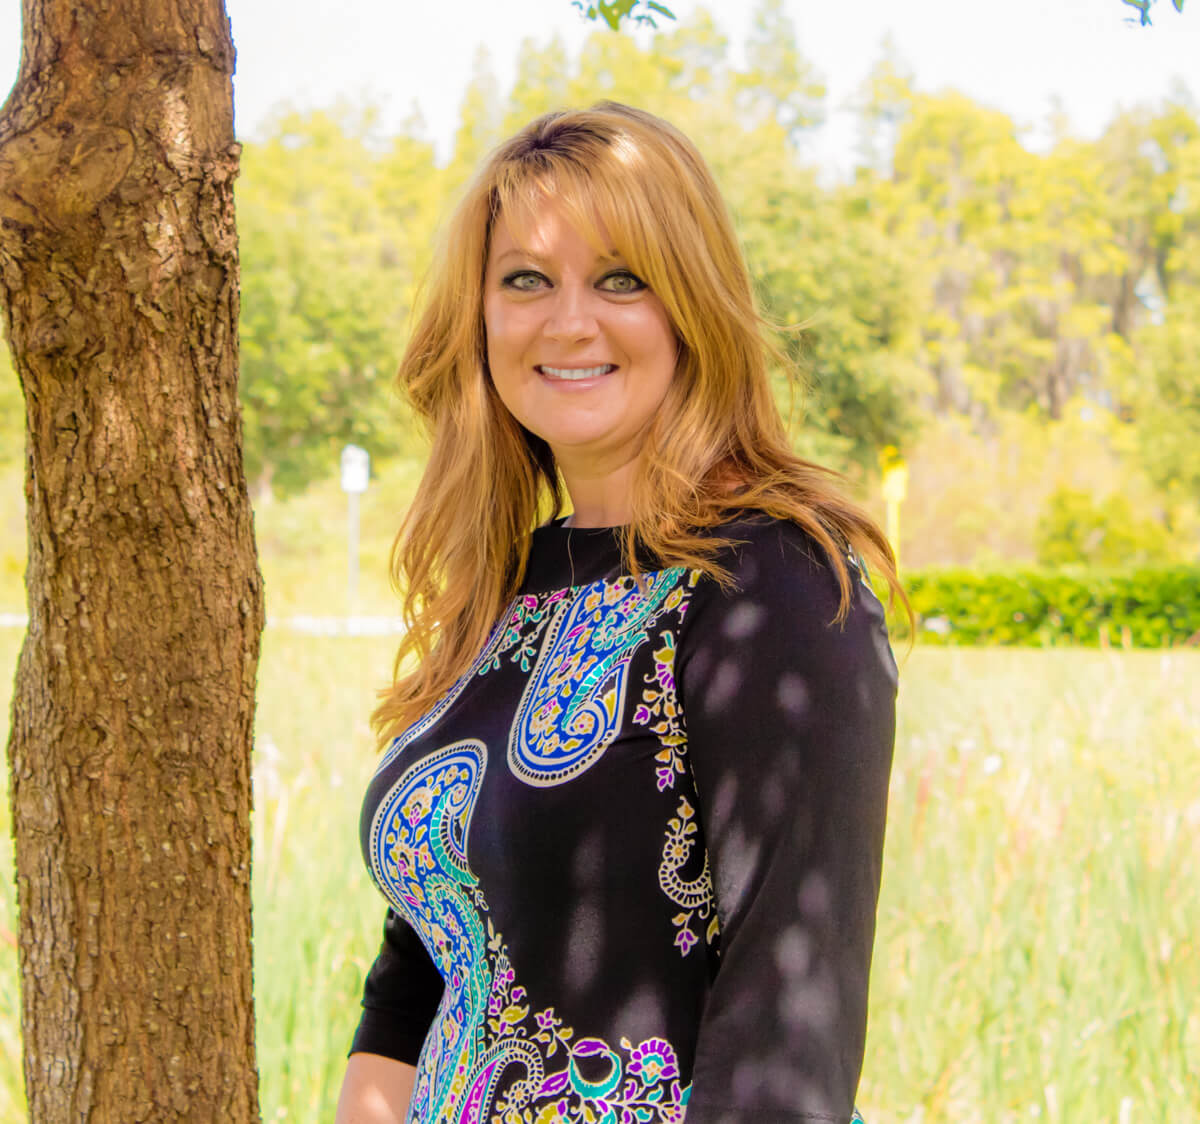 Jennifer Leal